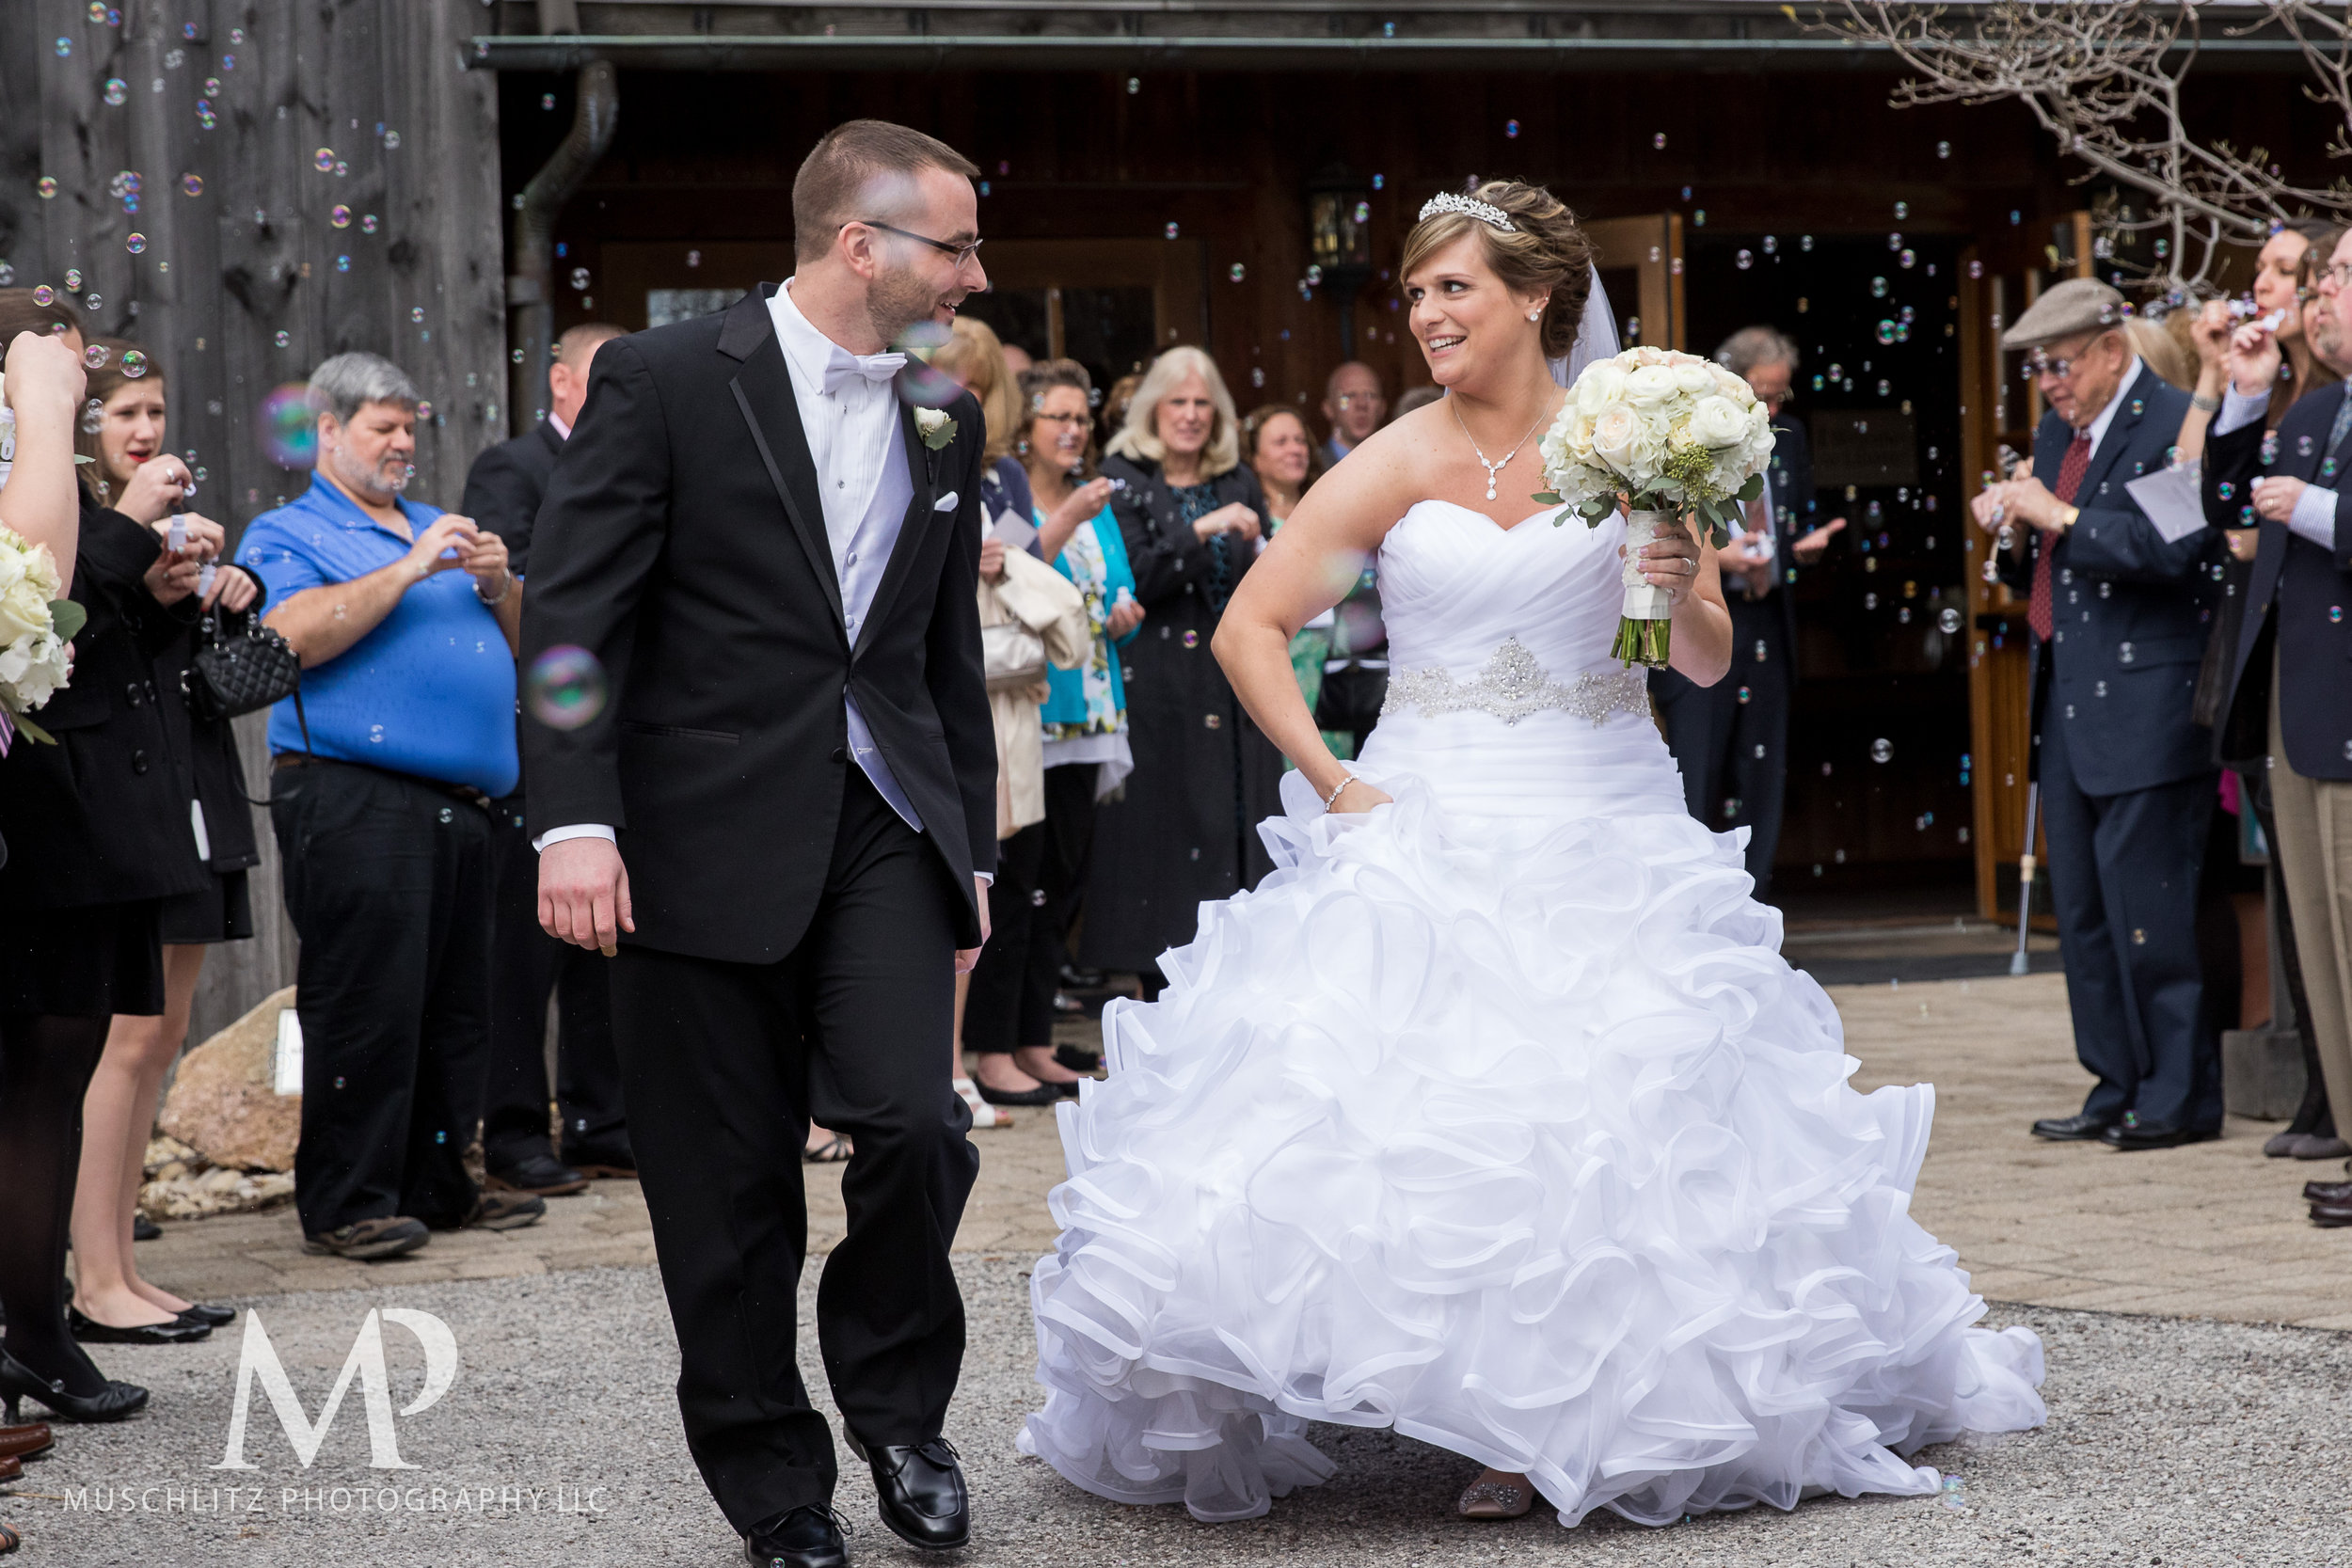 liberty-barn-presbyterian-church-wedding-delaware-columbus-ohio-muschlitz-photography-046.JPG